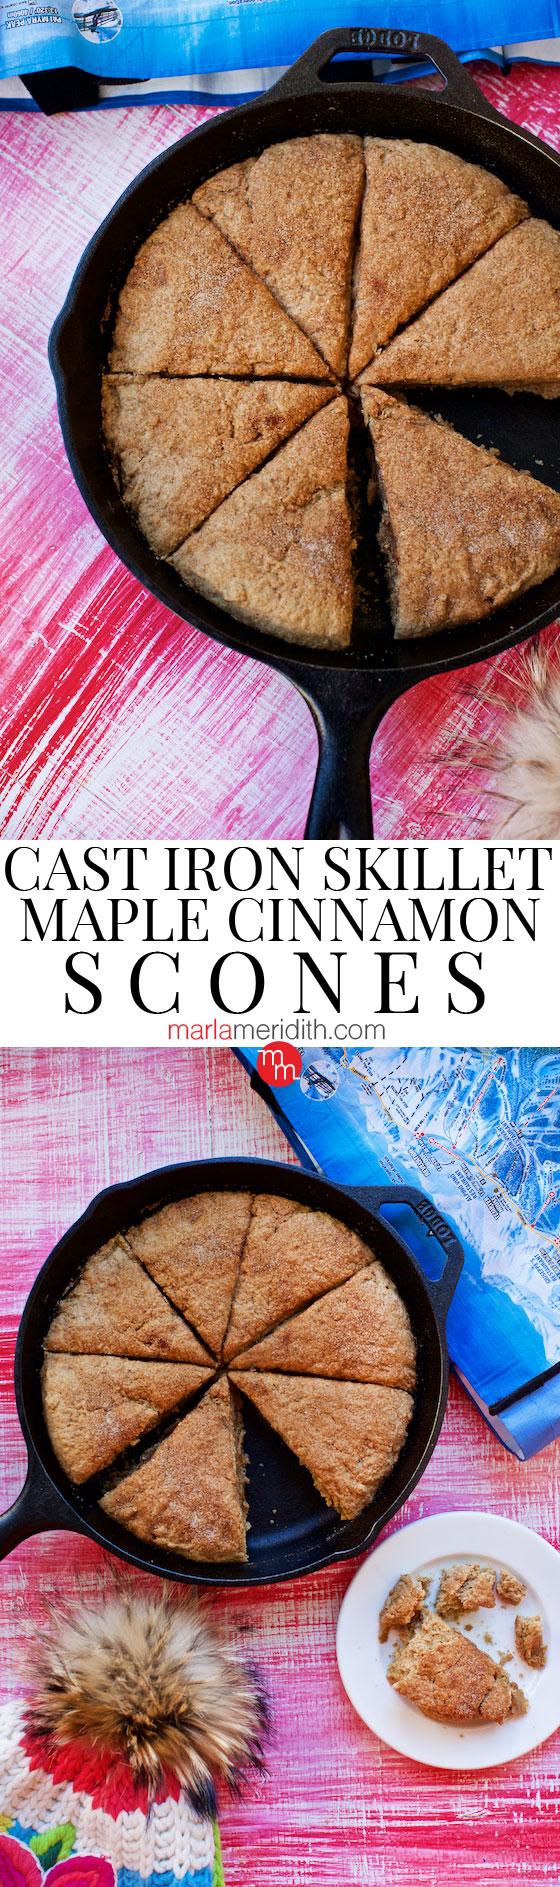 Cast Iron Skillet Maple Cinnamon Scones | MarlaMeridith.com ( @marlameridith )